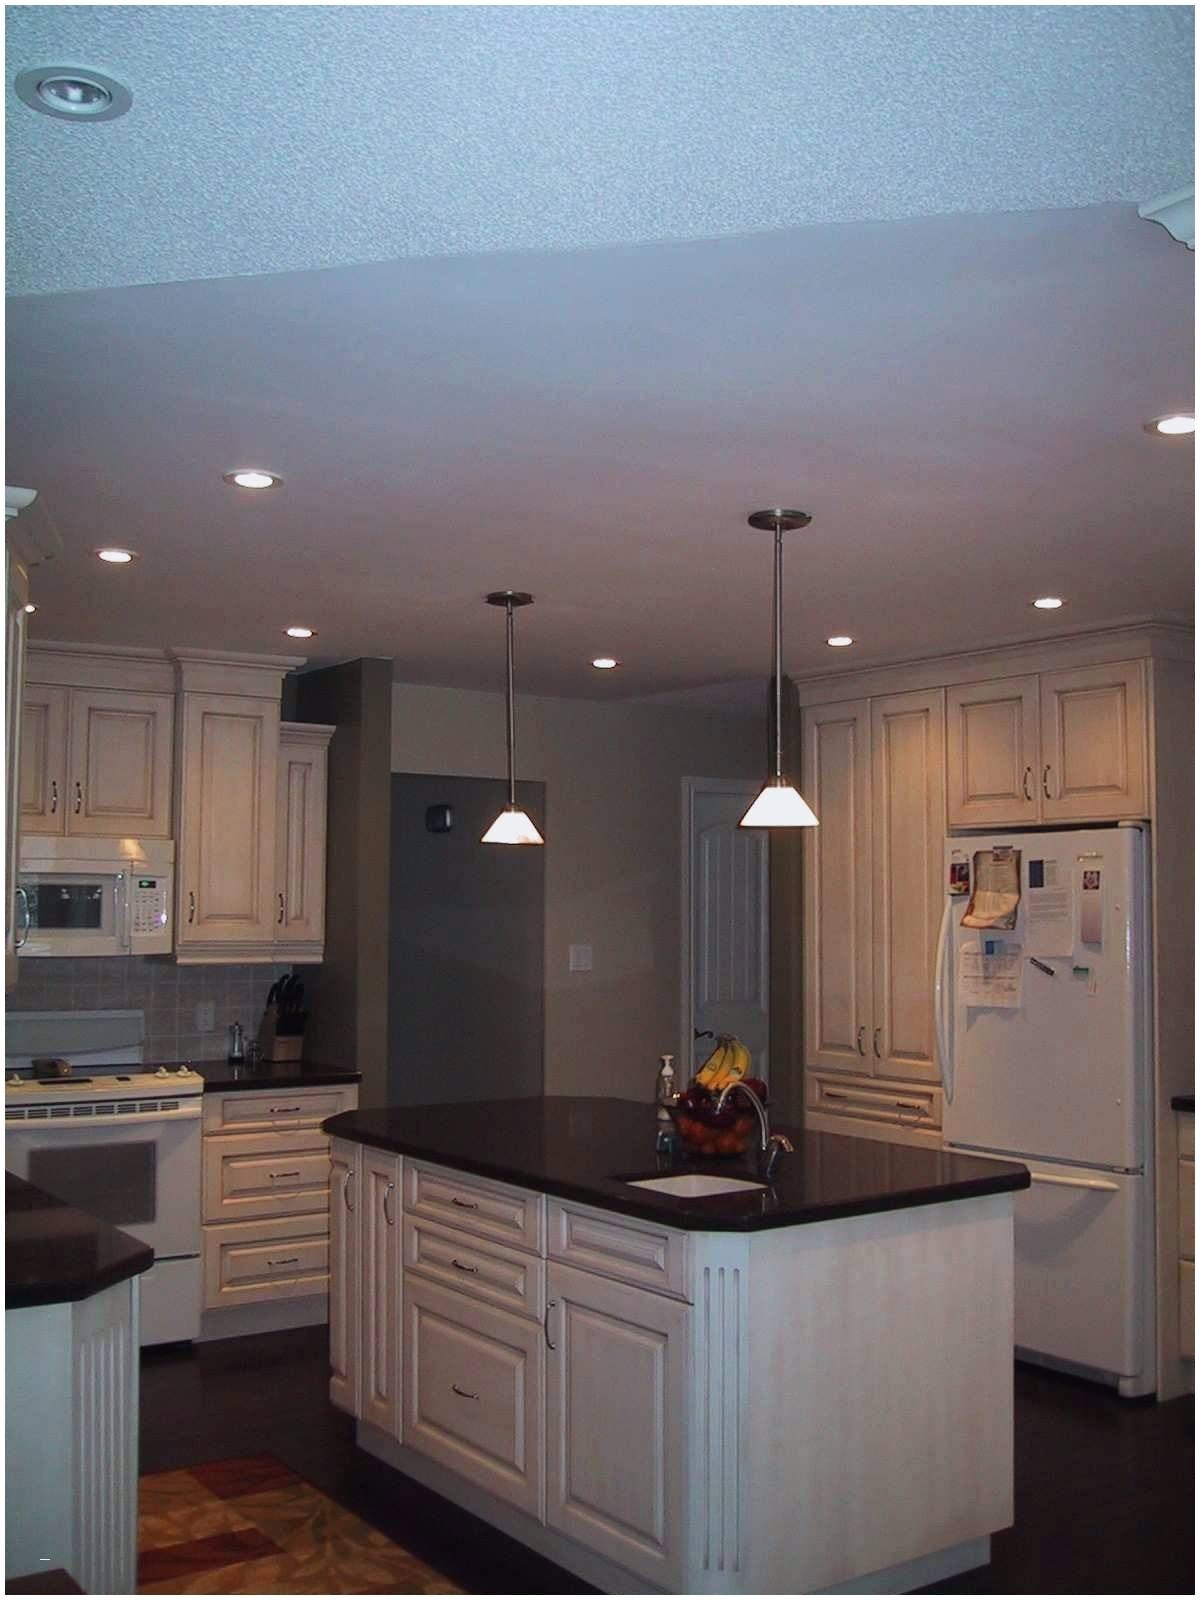 Contemporary Kitchen Interior Design Awesome Samples Kitchen Cabinet Doors Awesome Kitchen Design 0d Design